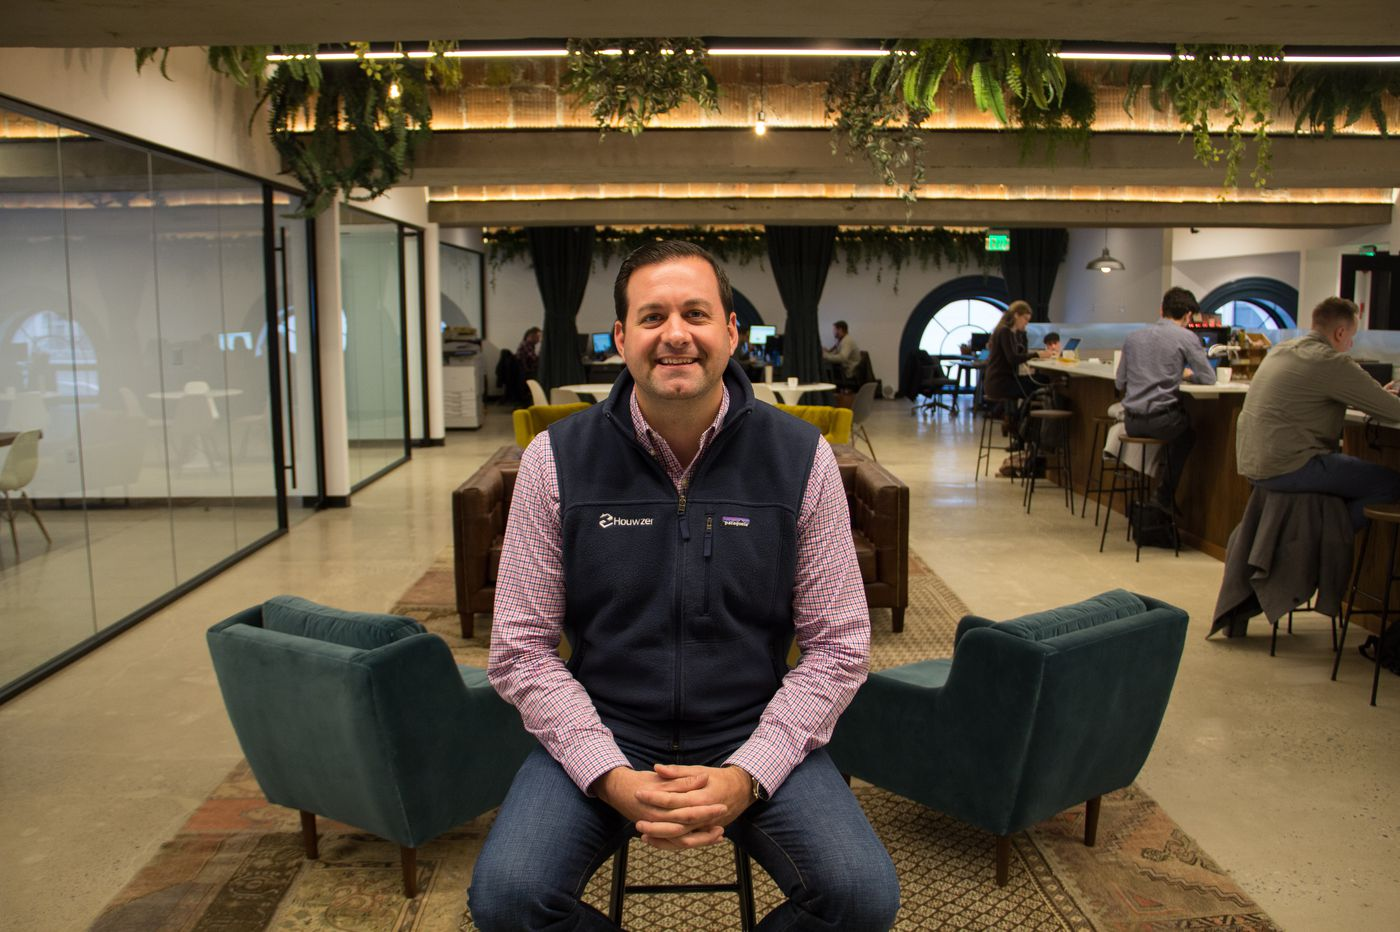 Philly real estate start-up Houwzer raises $9.5 million; plans to enter Baltimore, Orlando markets